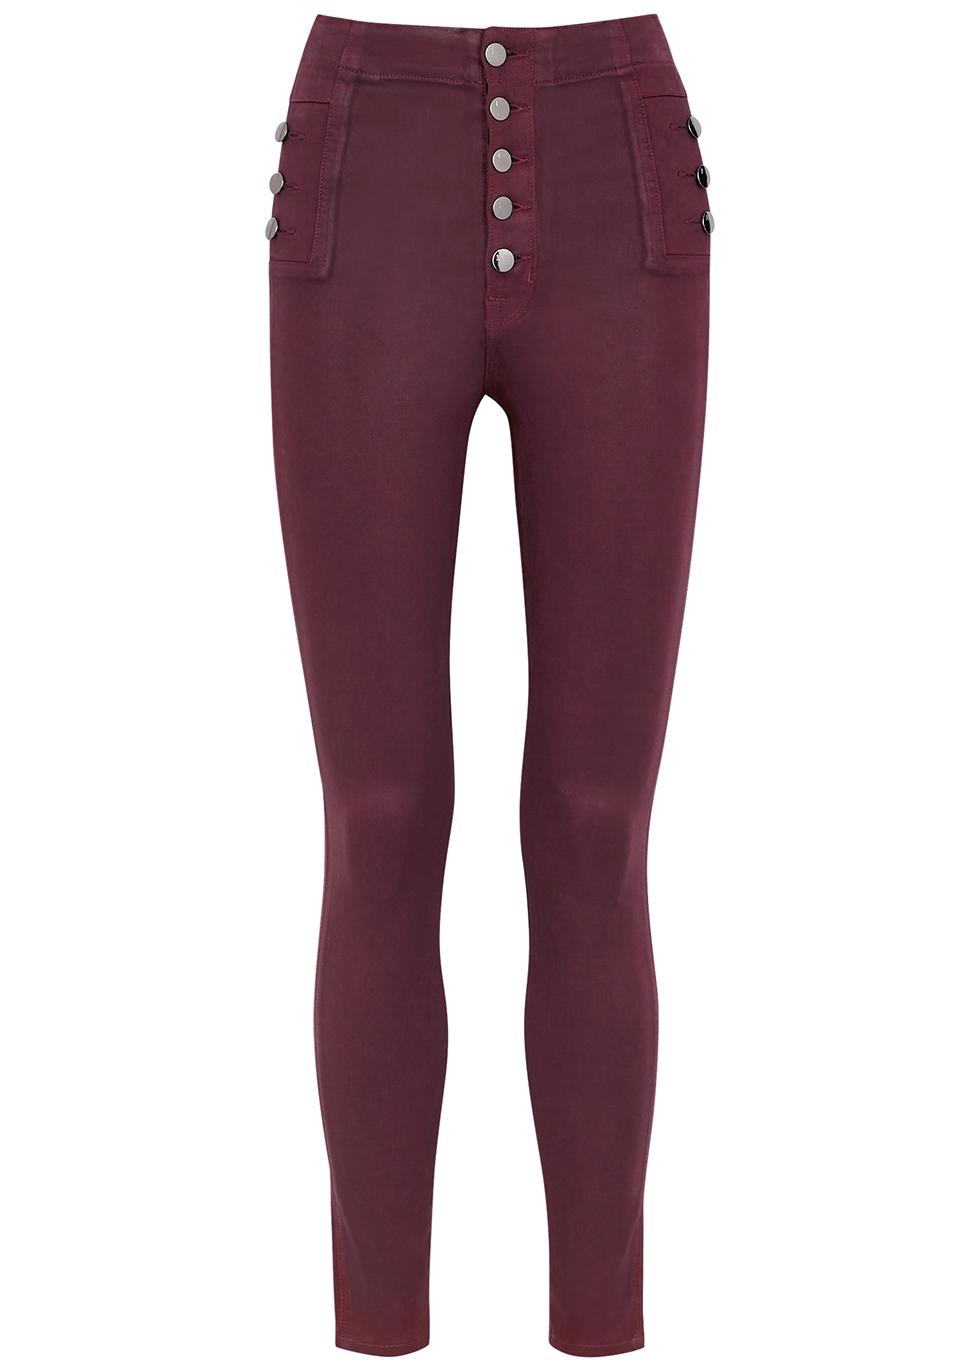 Natasha Sky High plum coated skinny jeans